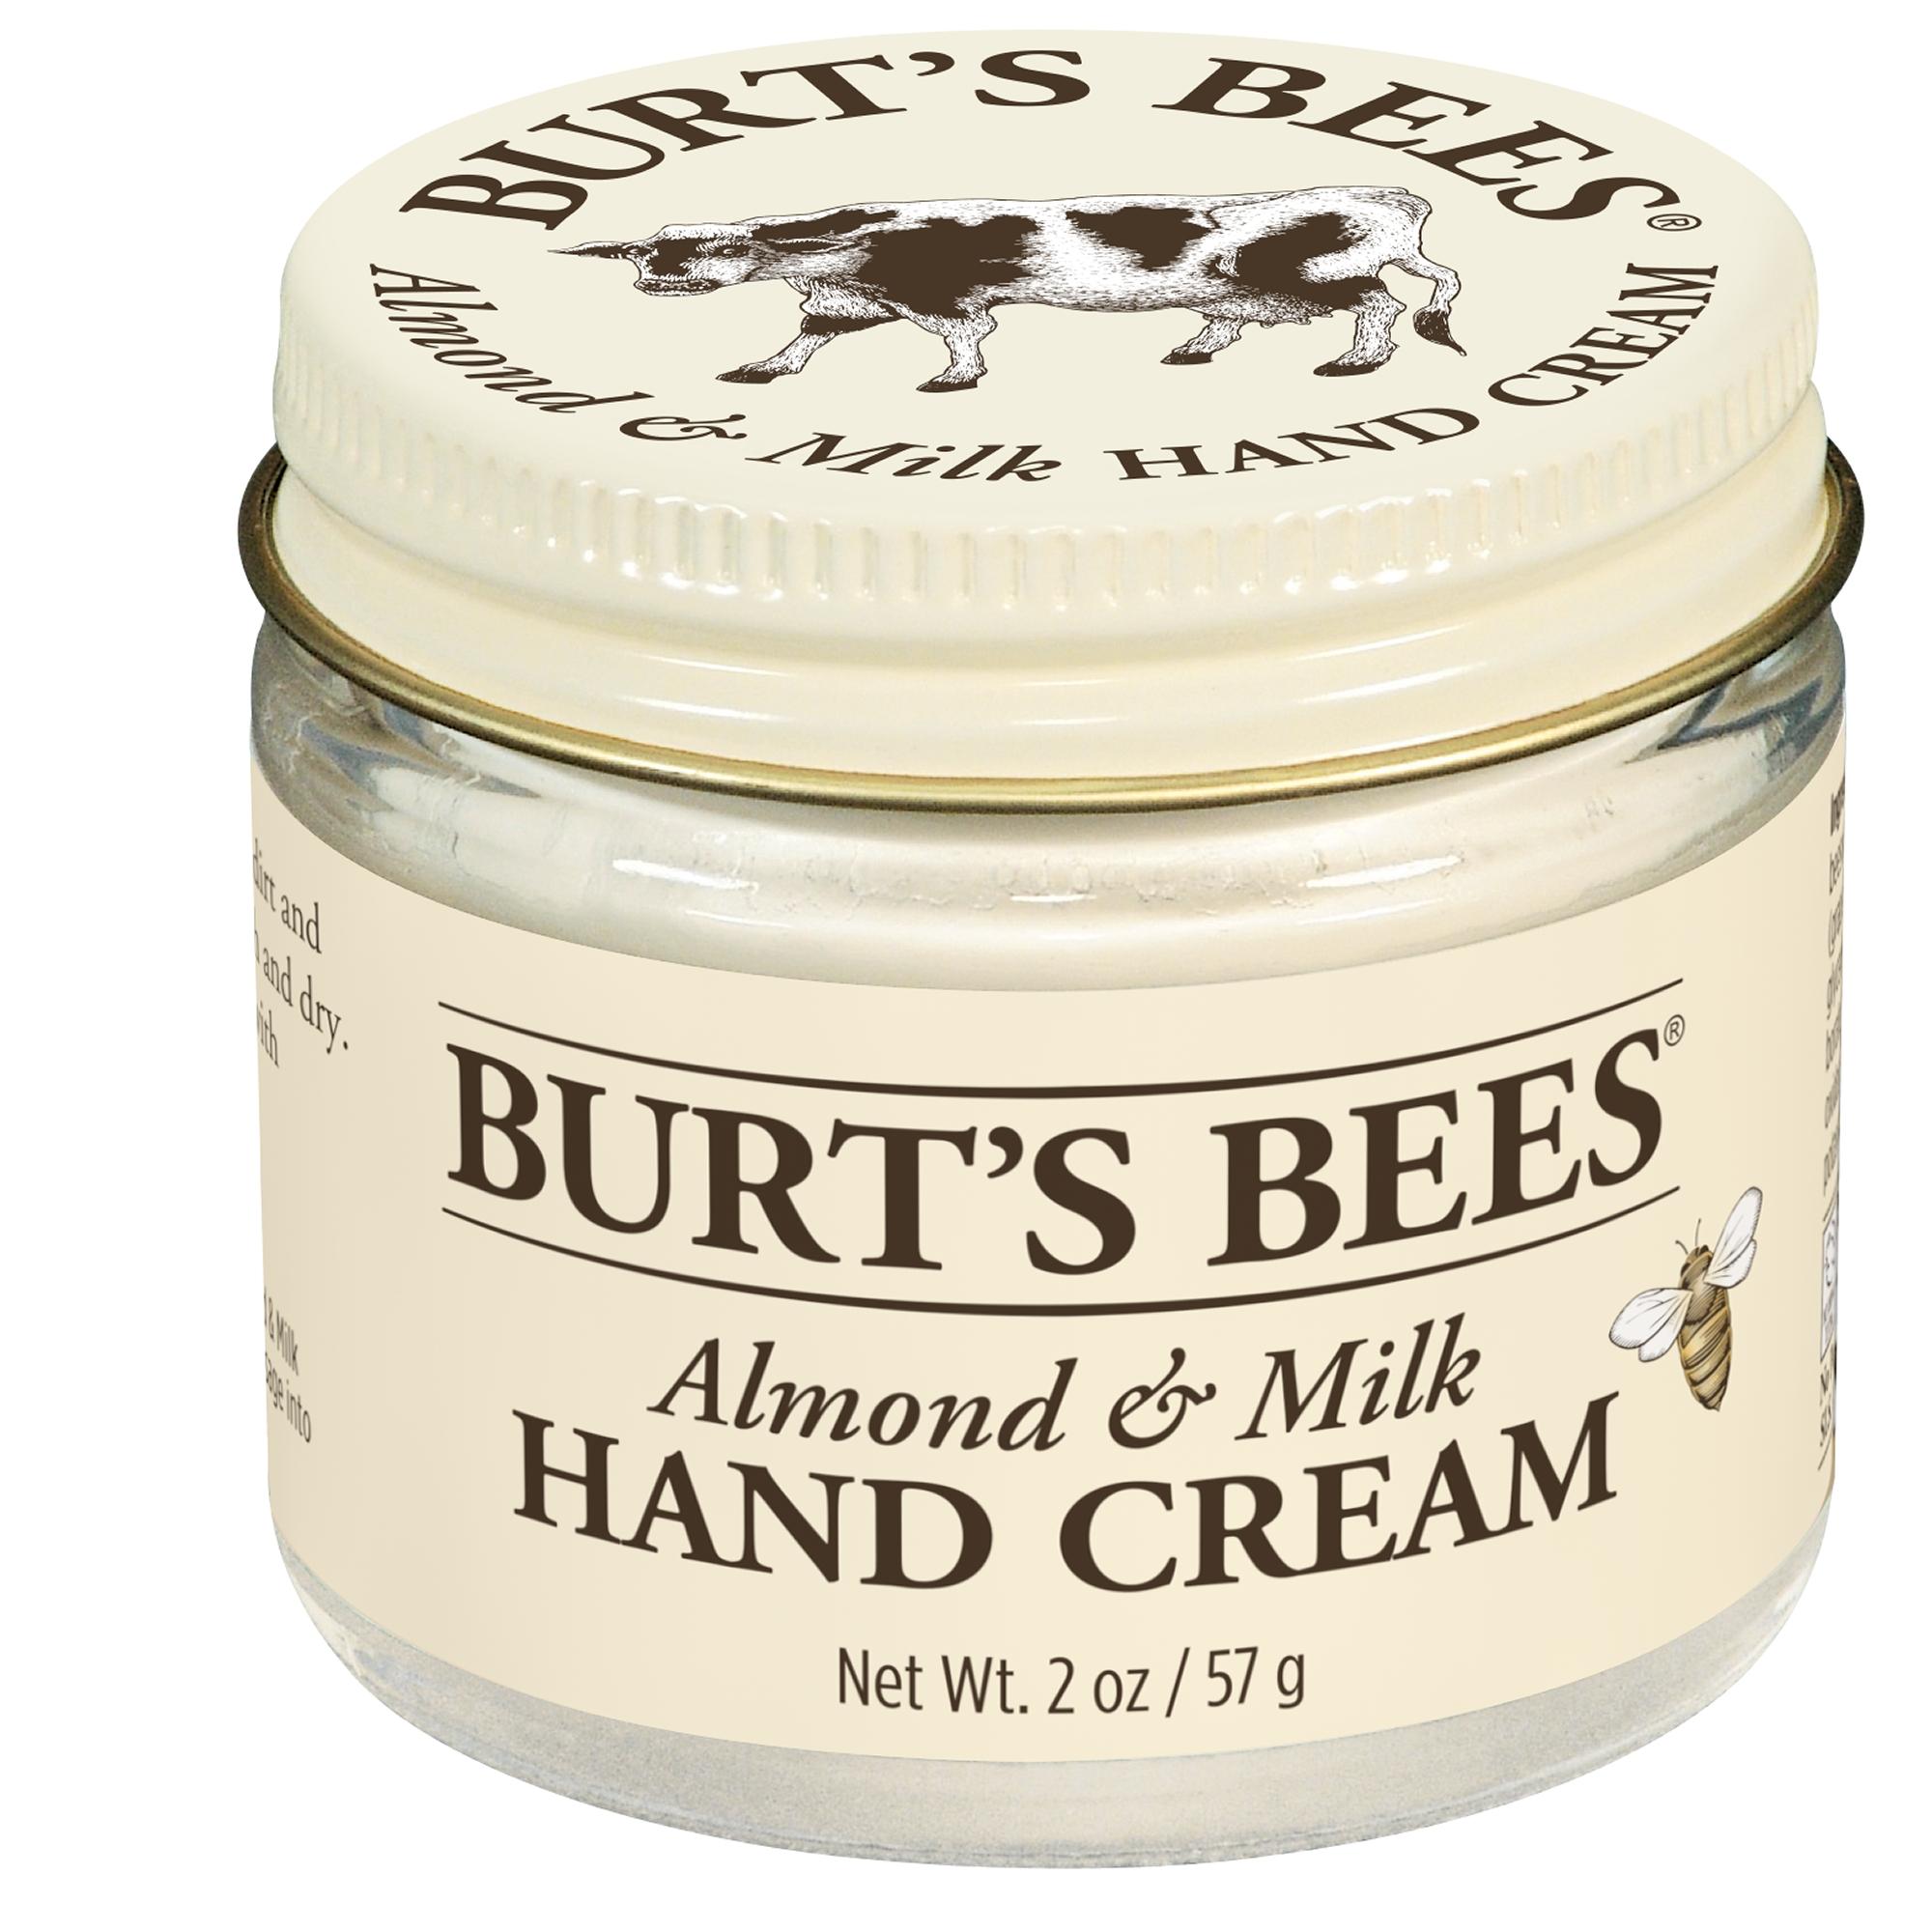 Burt's Bees Almond &  Milk Hand Cream - 2 oz Jar